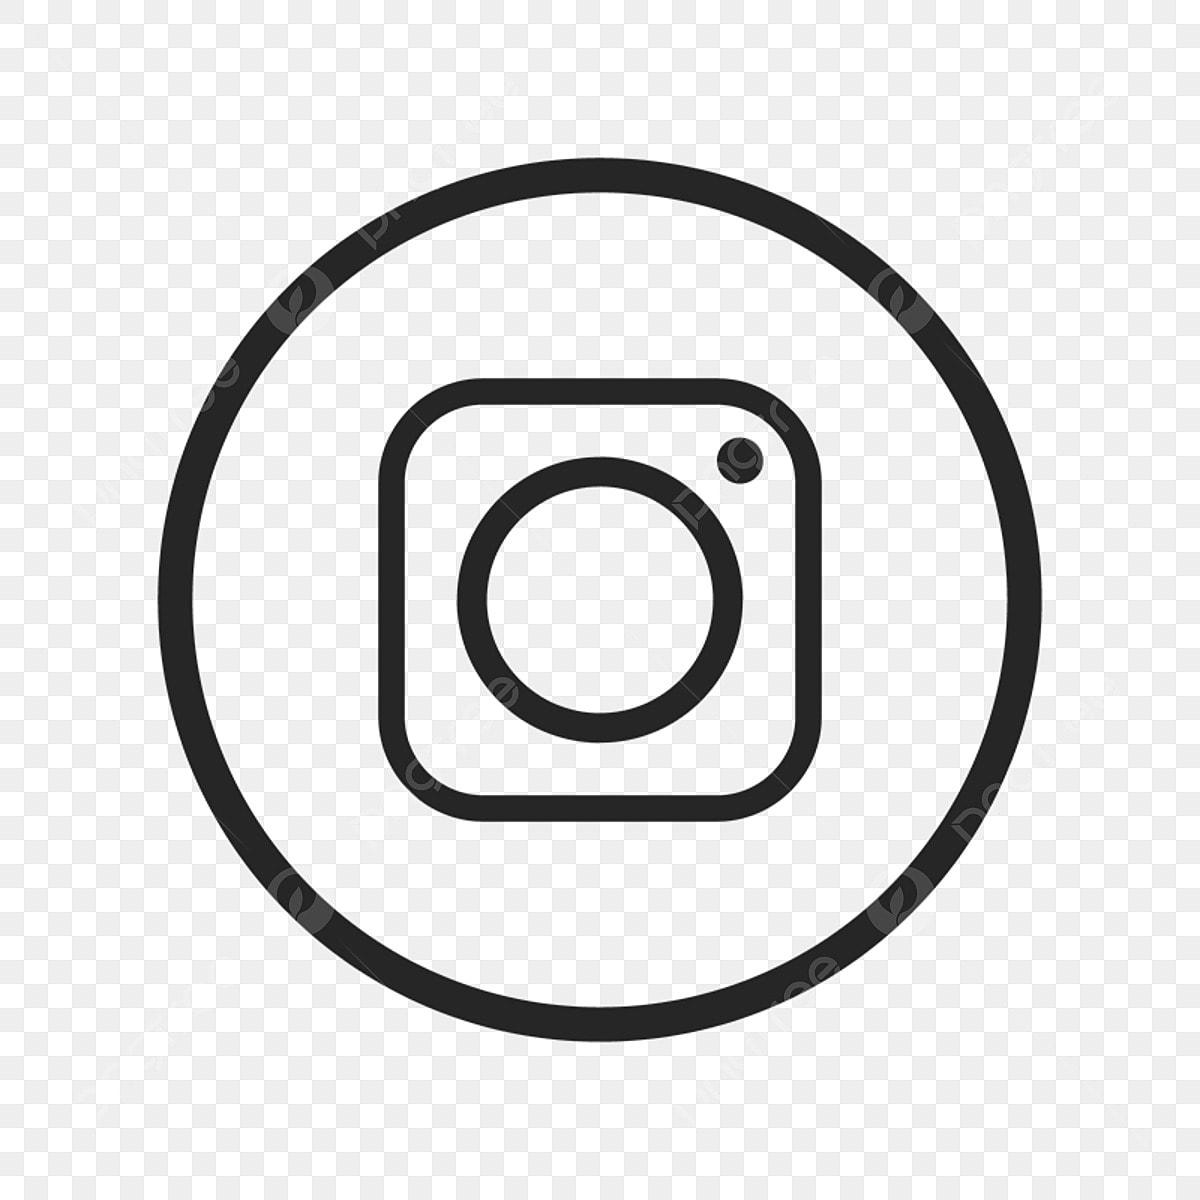 101+ Gambar Logo Instagram Png